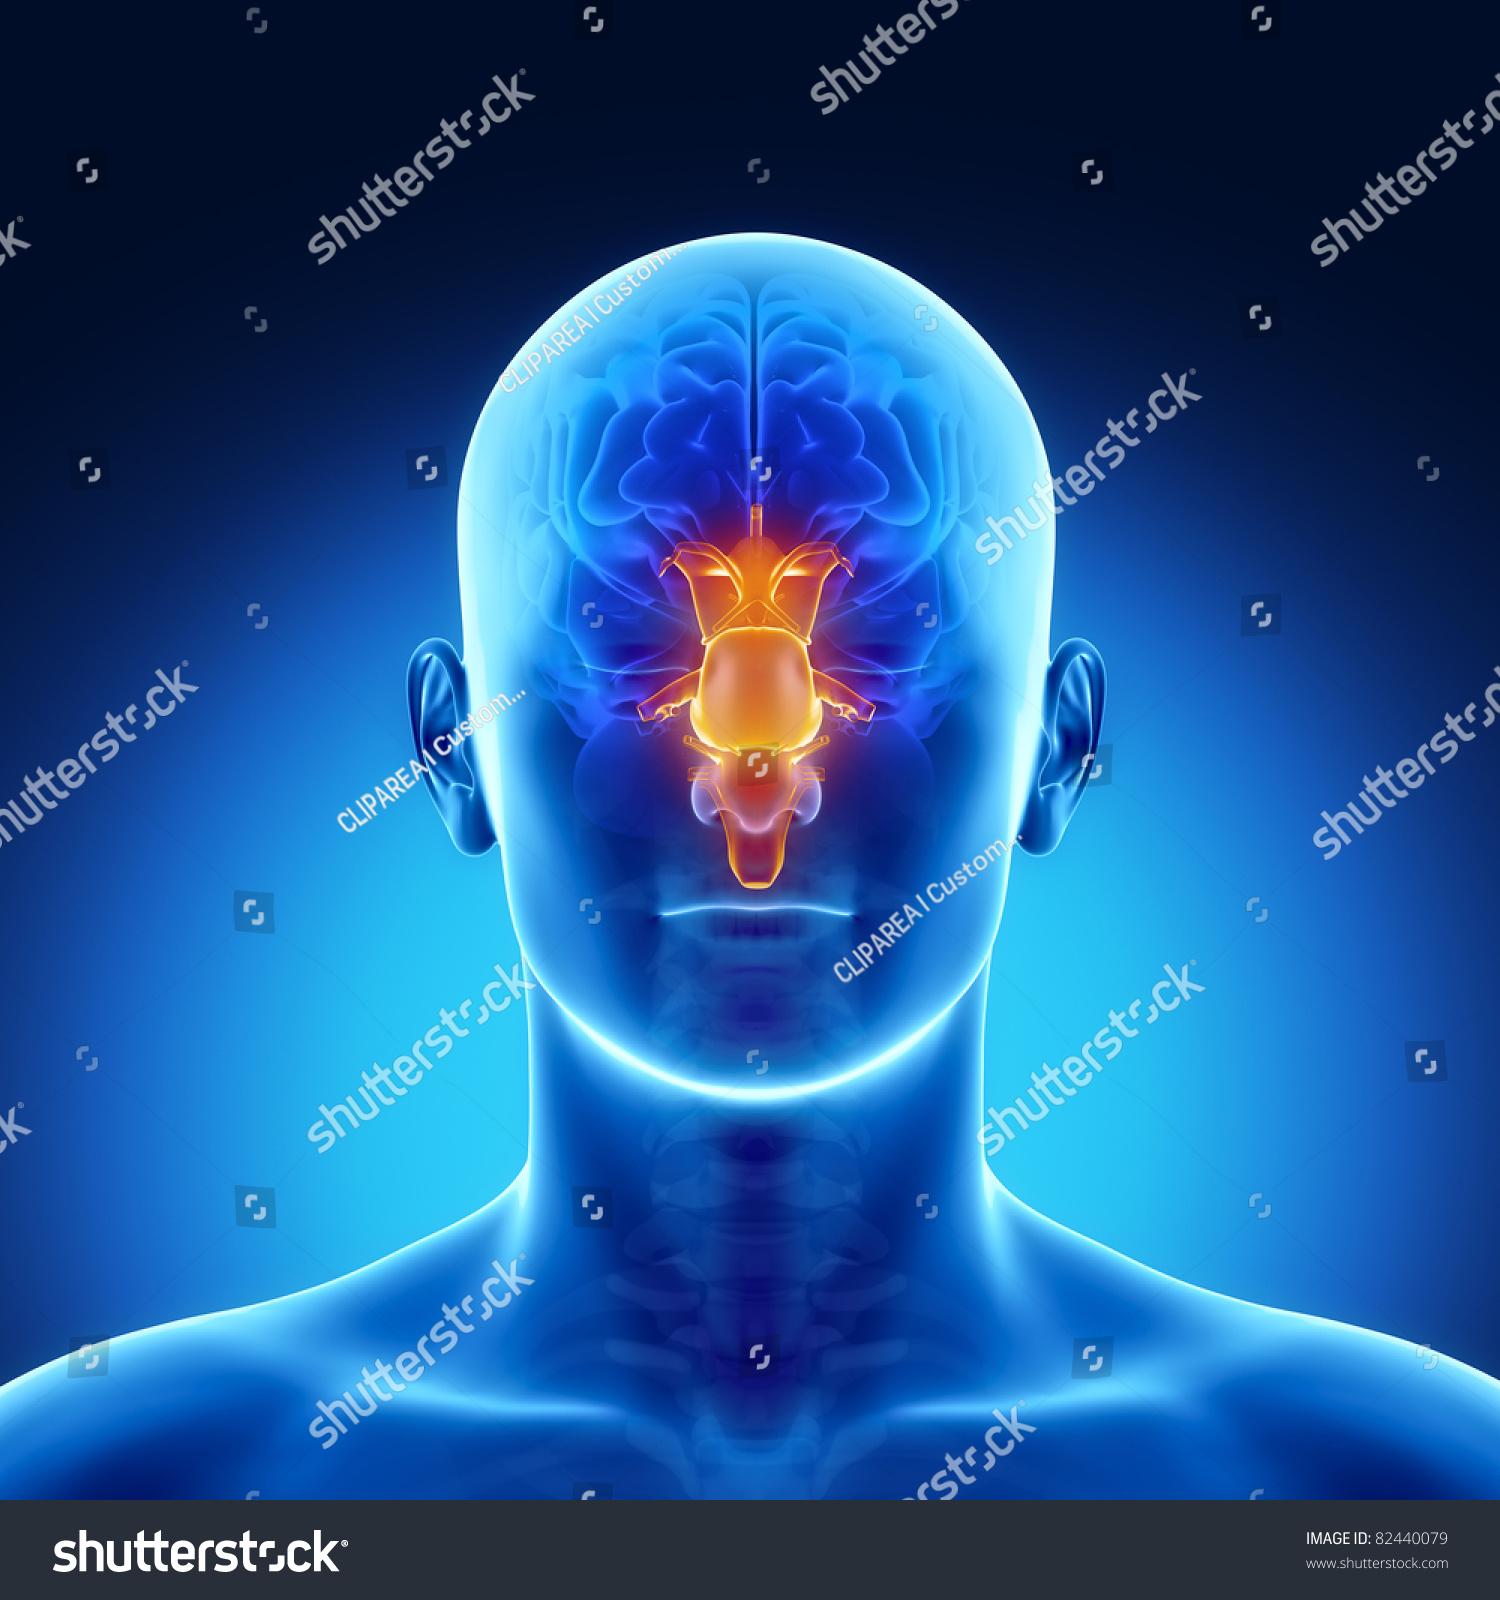 Male Anatomy Human Organs Xray View Stock Illustration 82440079 ...